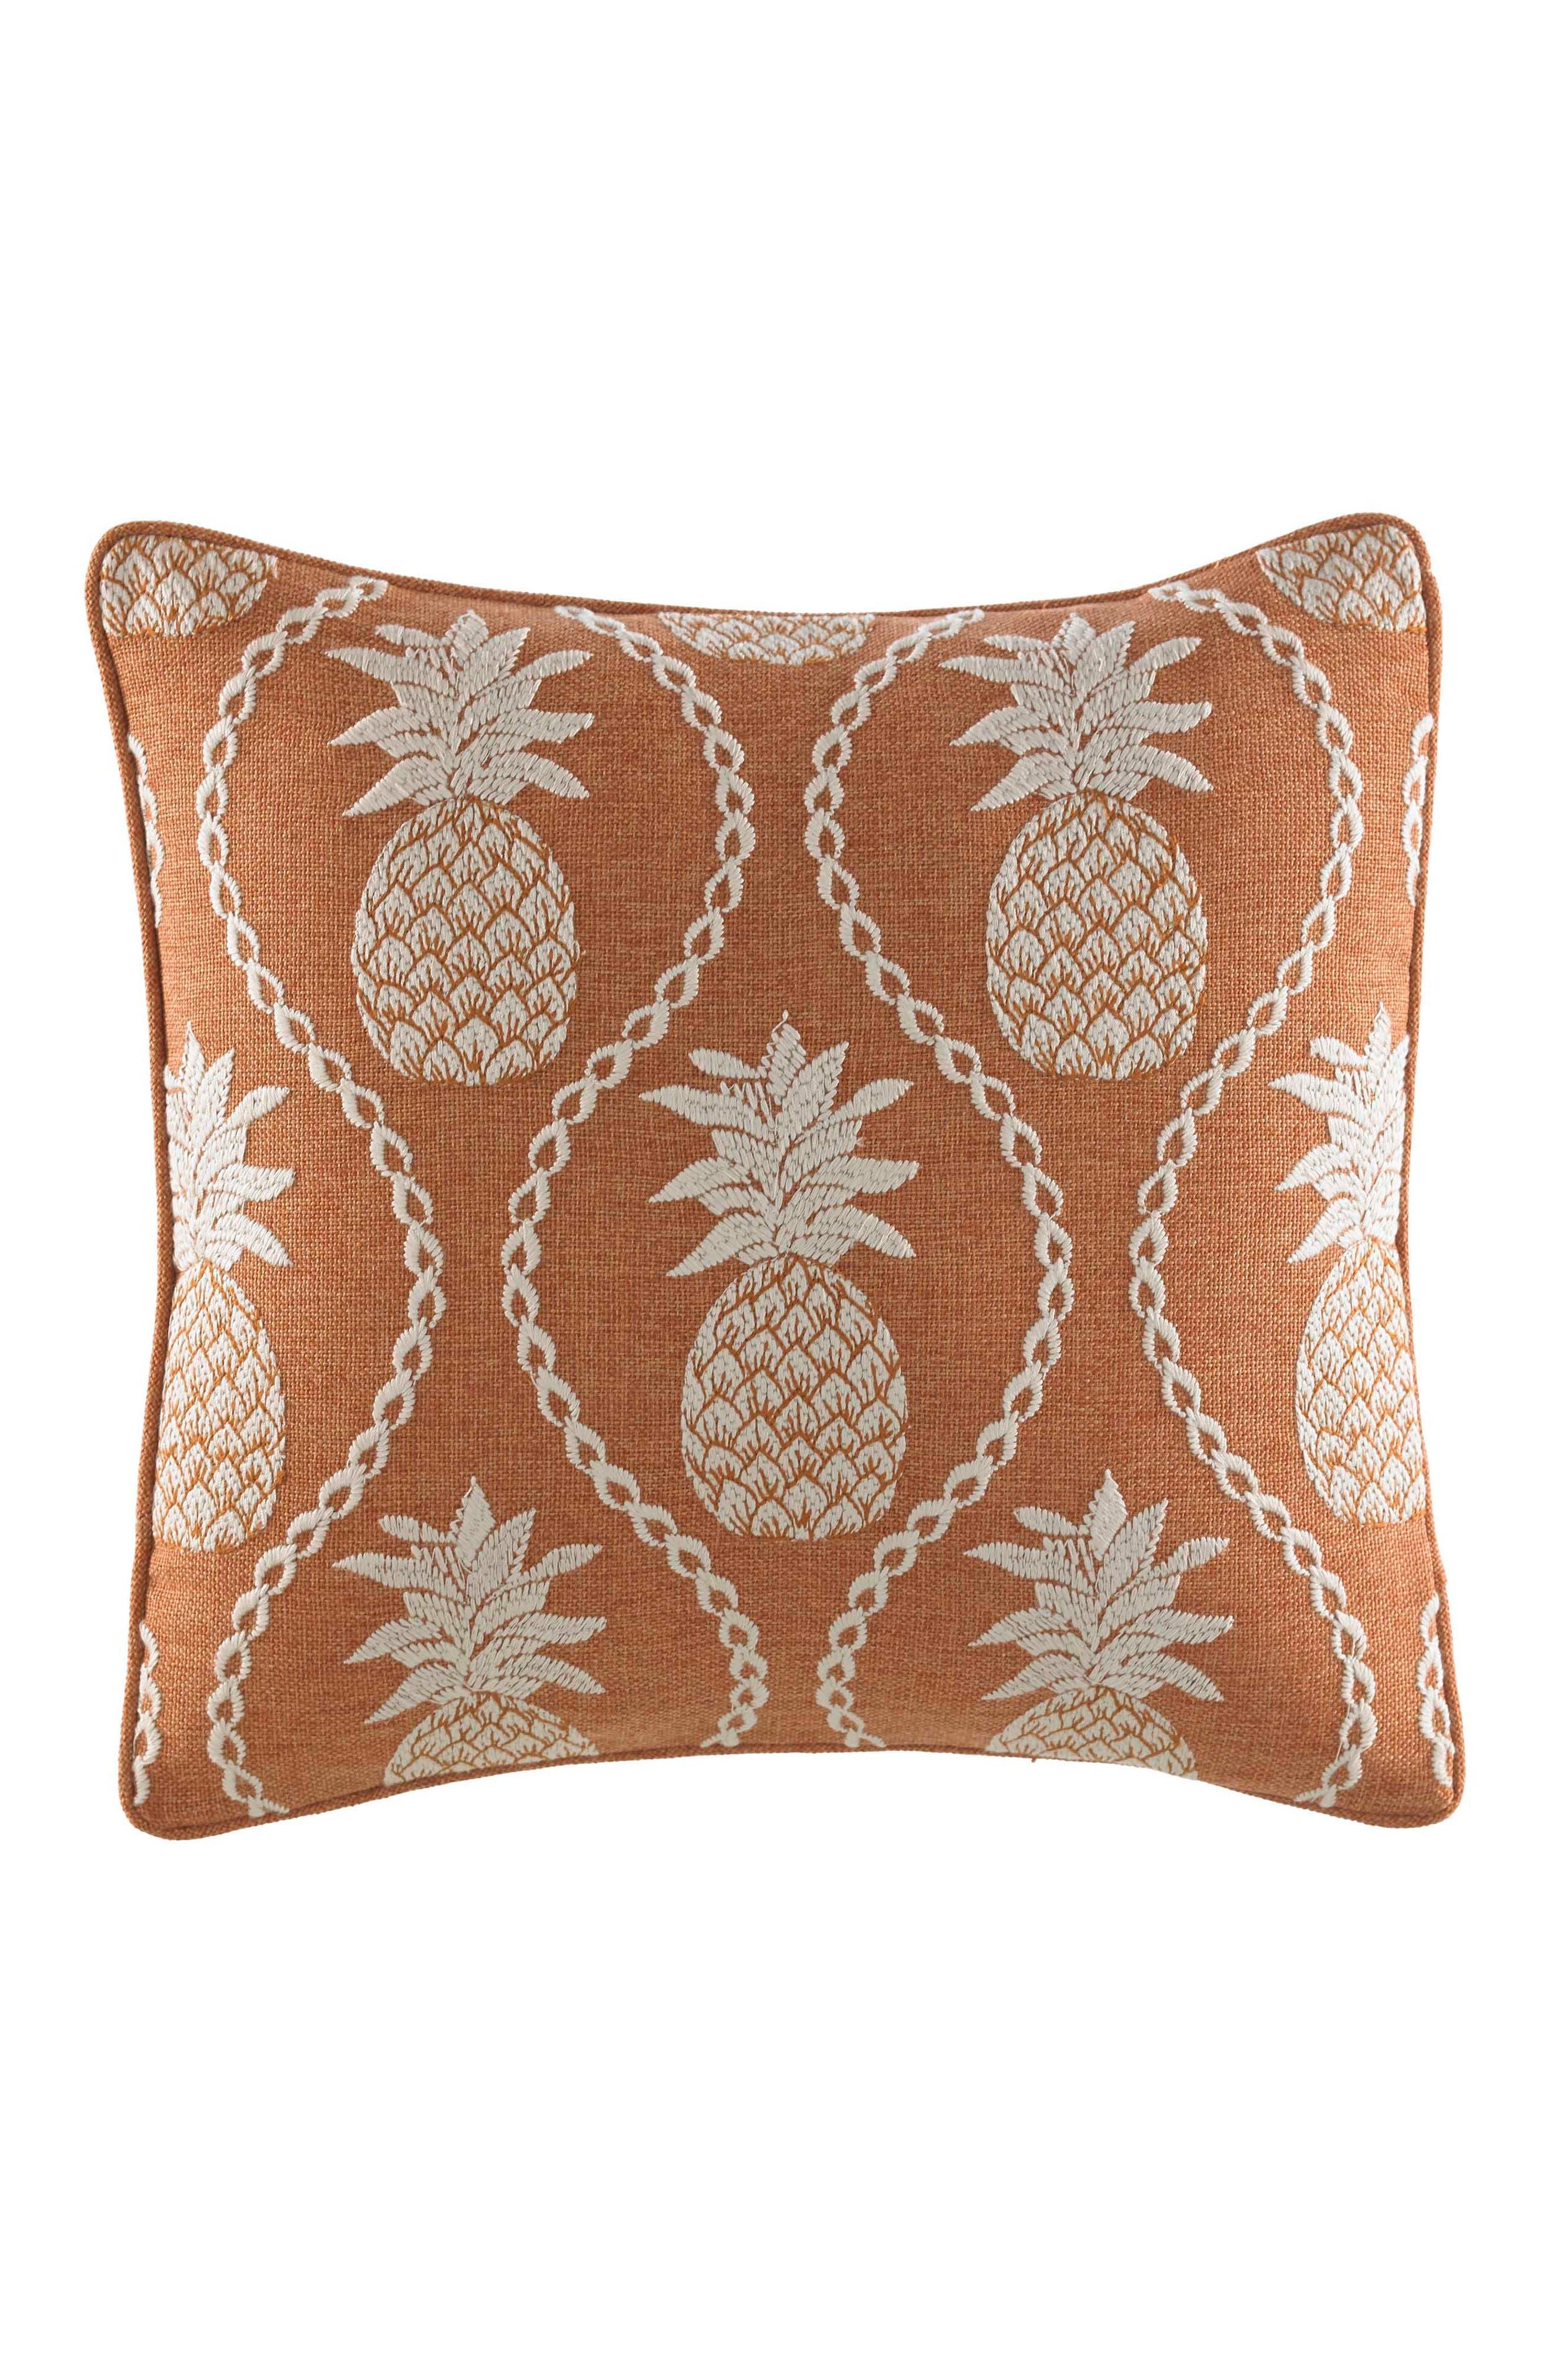 TOMMY BAHAMA,                             Batik Pineapple Accent Pillow,                             Main thumbnail 1, color,                             BURNT CORAL